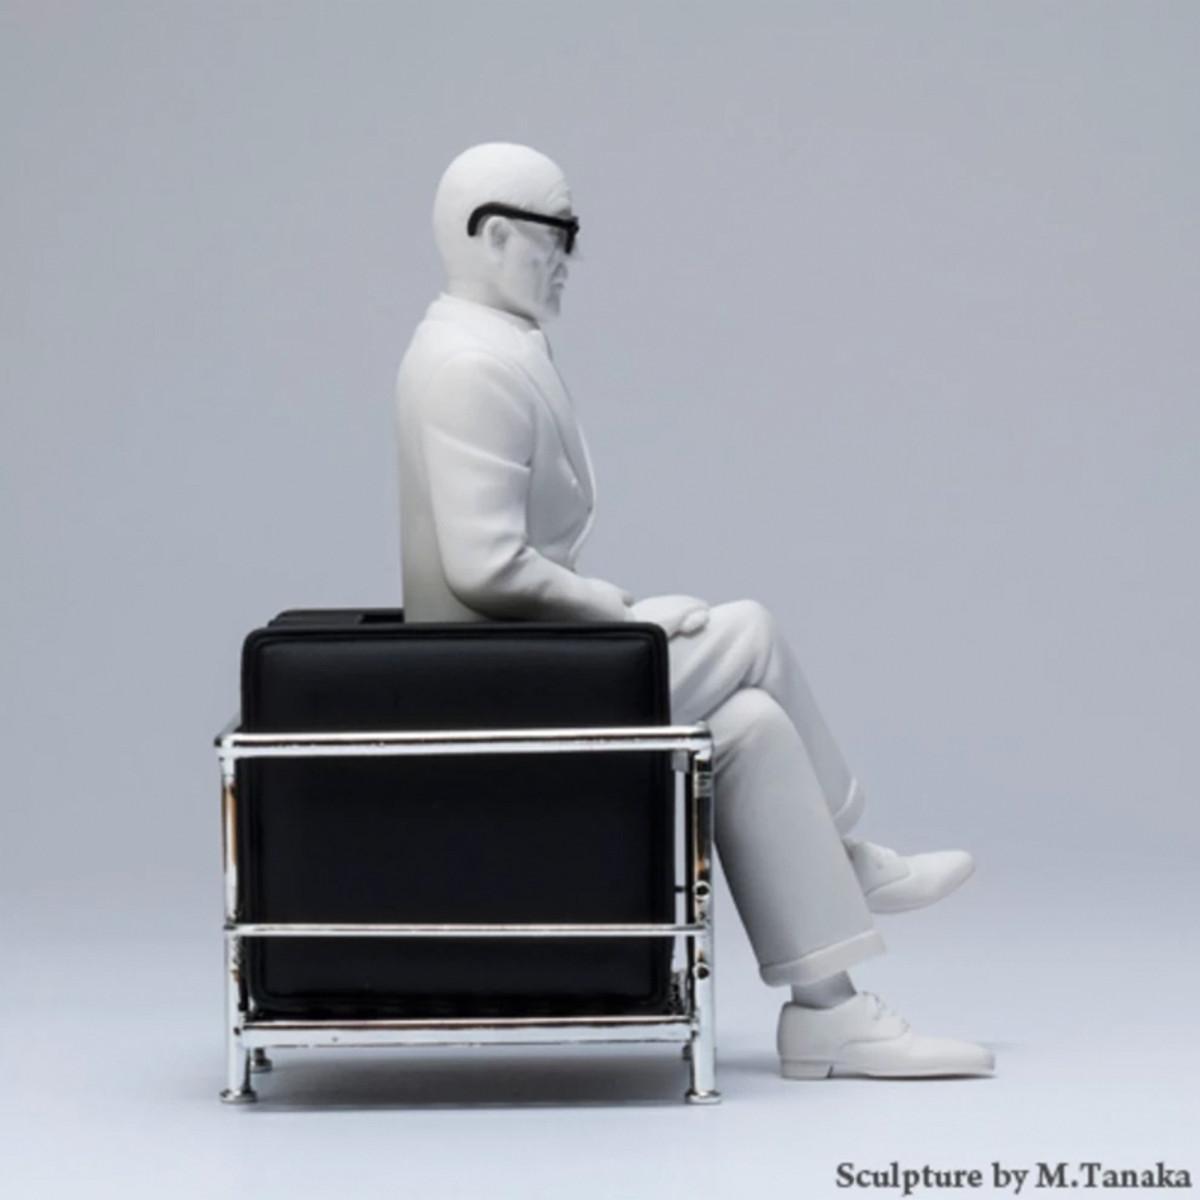 ... Design Interior Collection : Le Corbusier In LC2 Chair ...